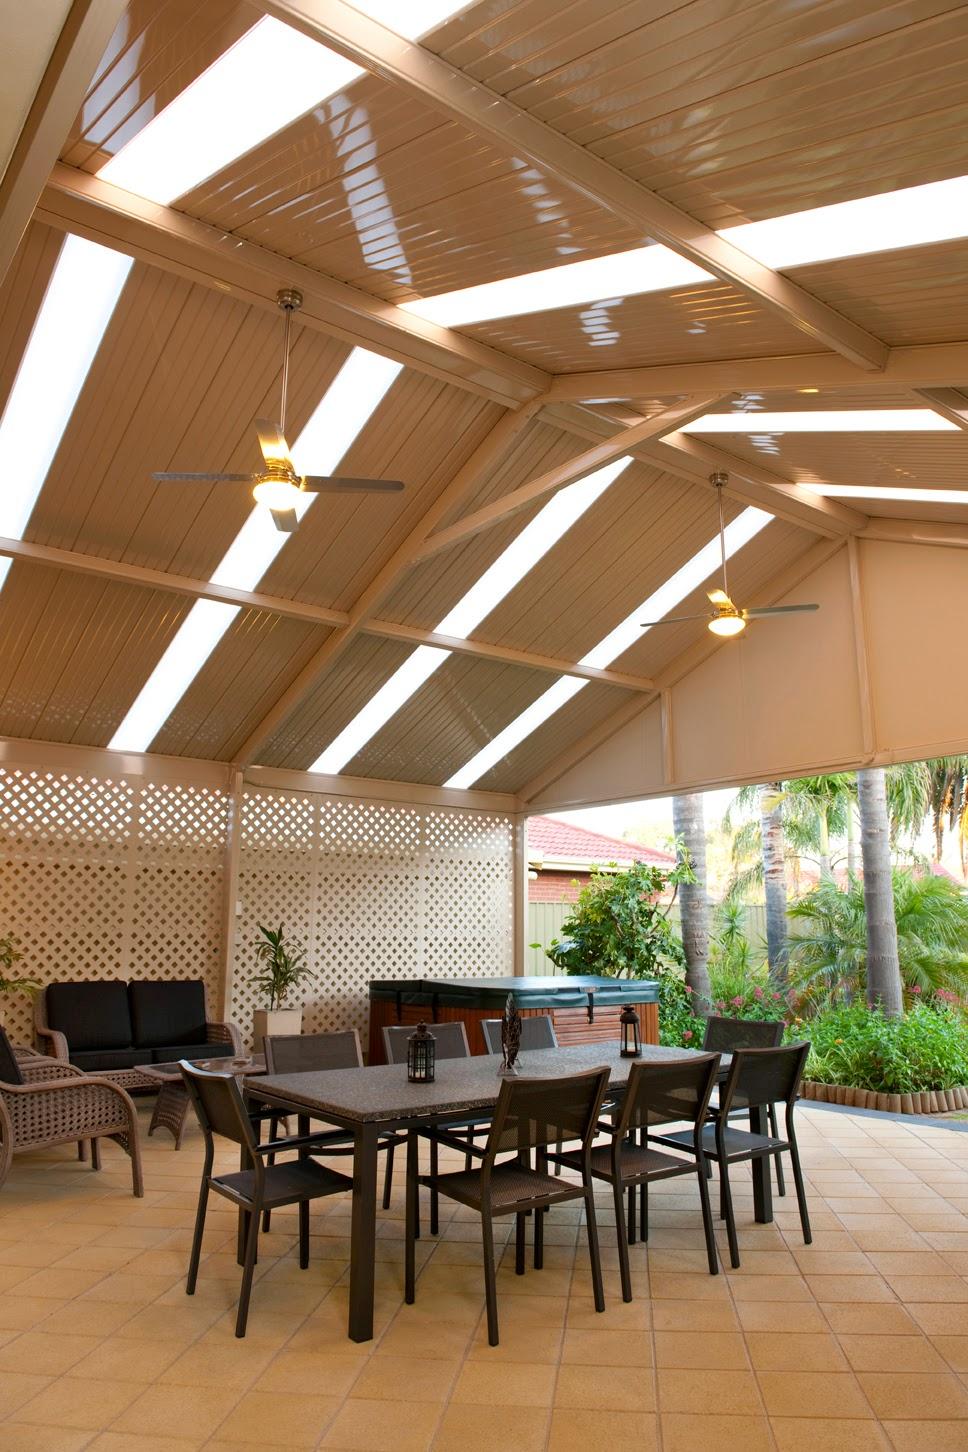 Aldinga Home Improvements Roofing Contractor Lot 110 Aldinga Beach Rd Aldinga Beach Sa 5173 Australia